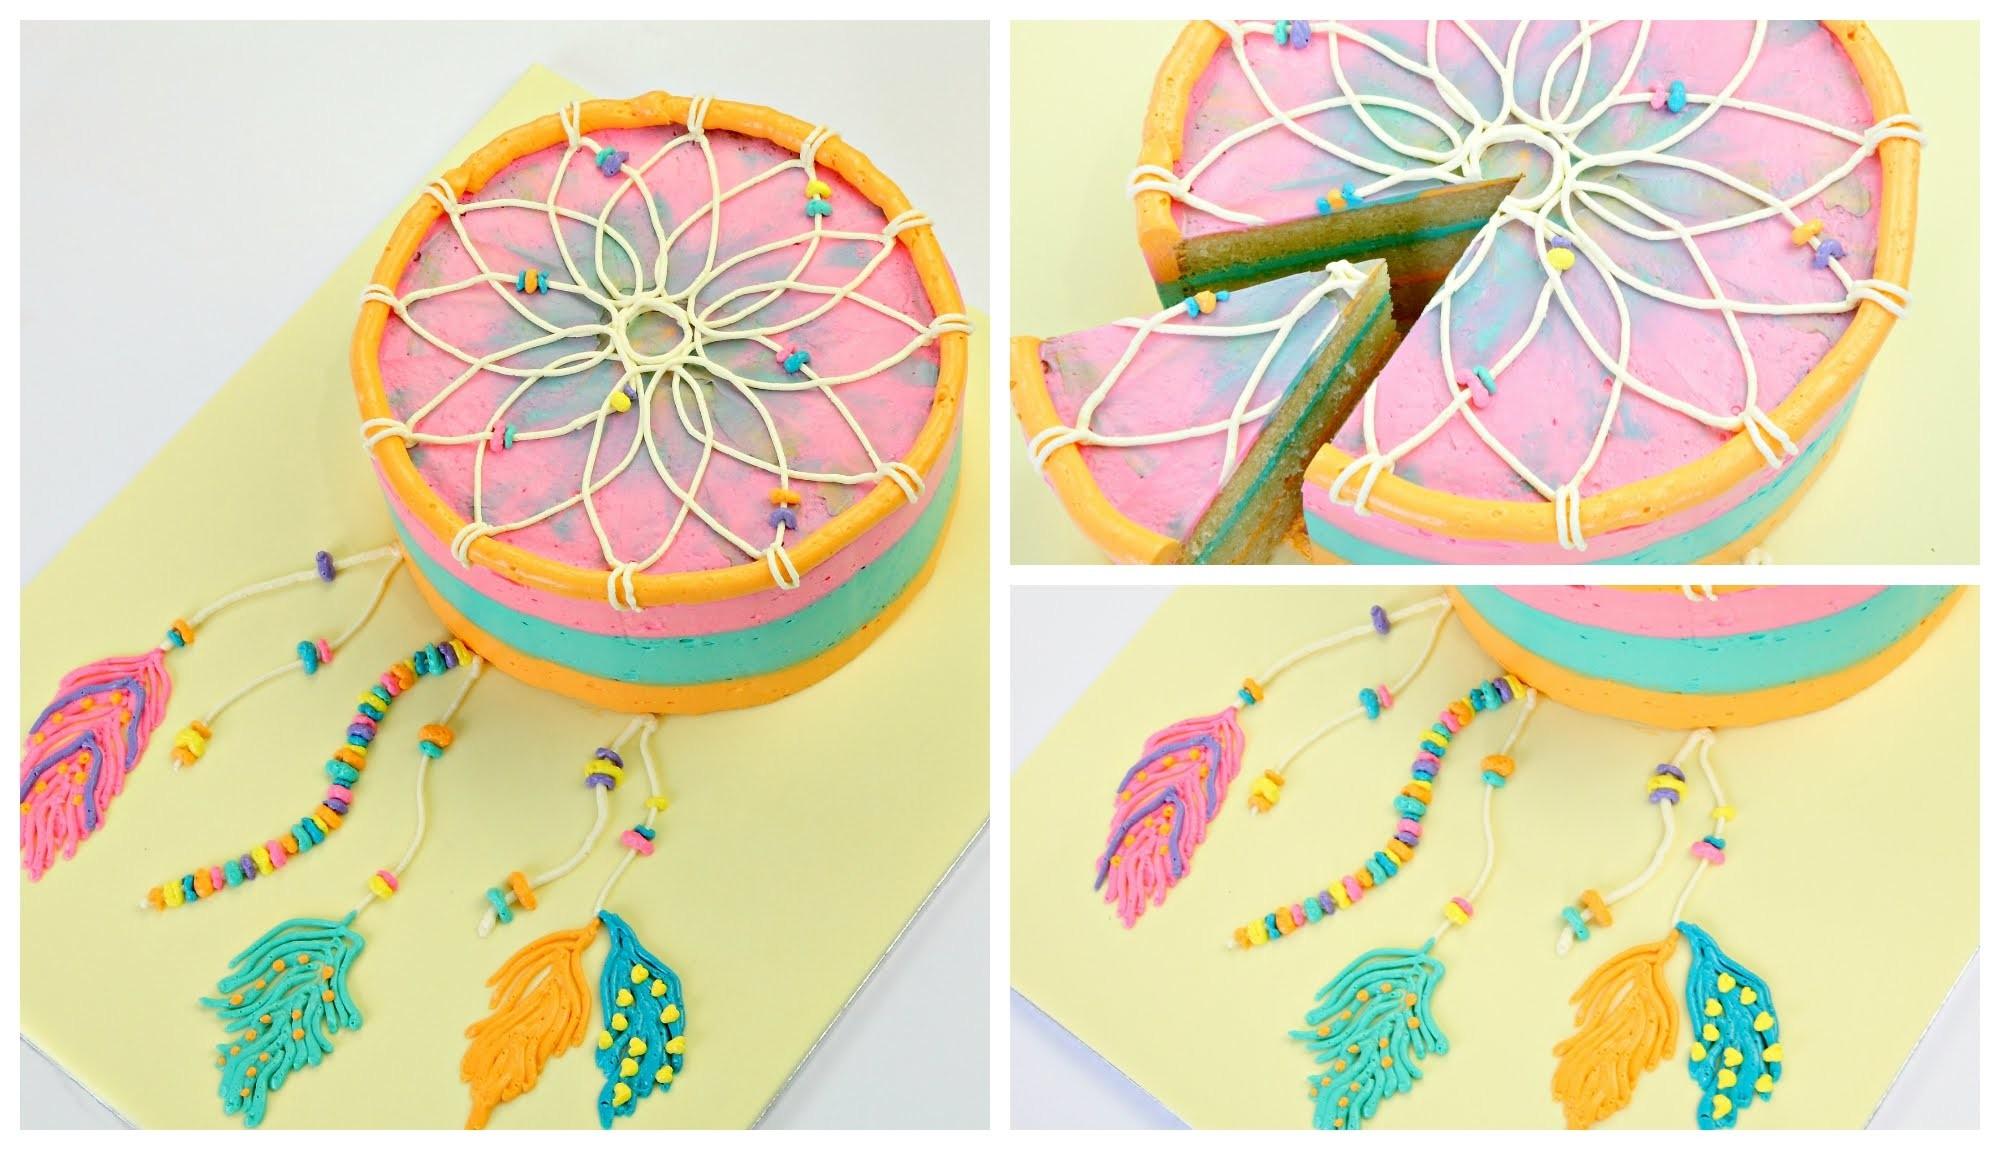 Dreamcatcher Swiss Meringue Buttercream Cake - CAKE STYLE